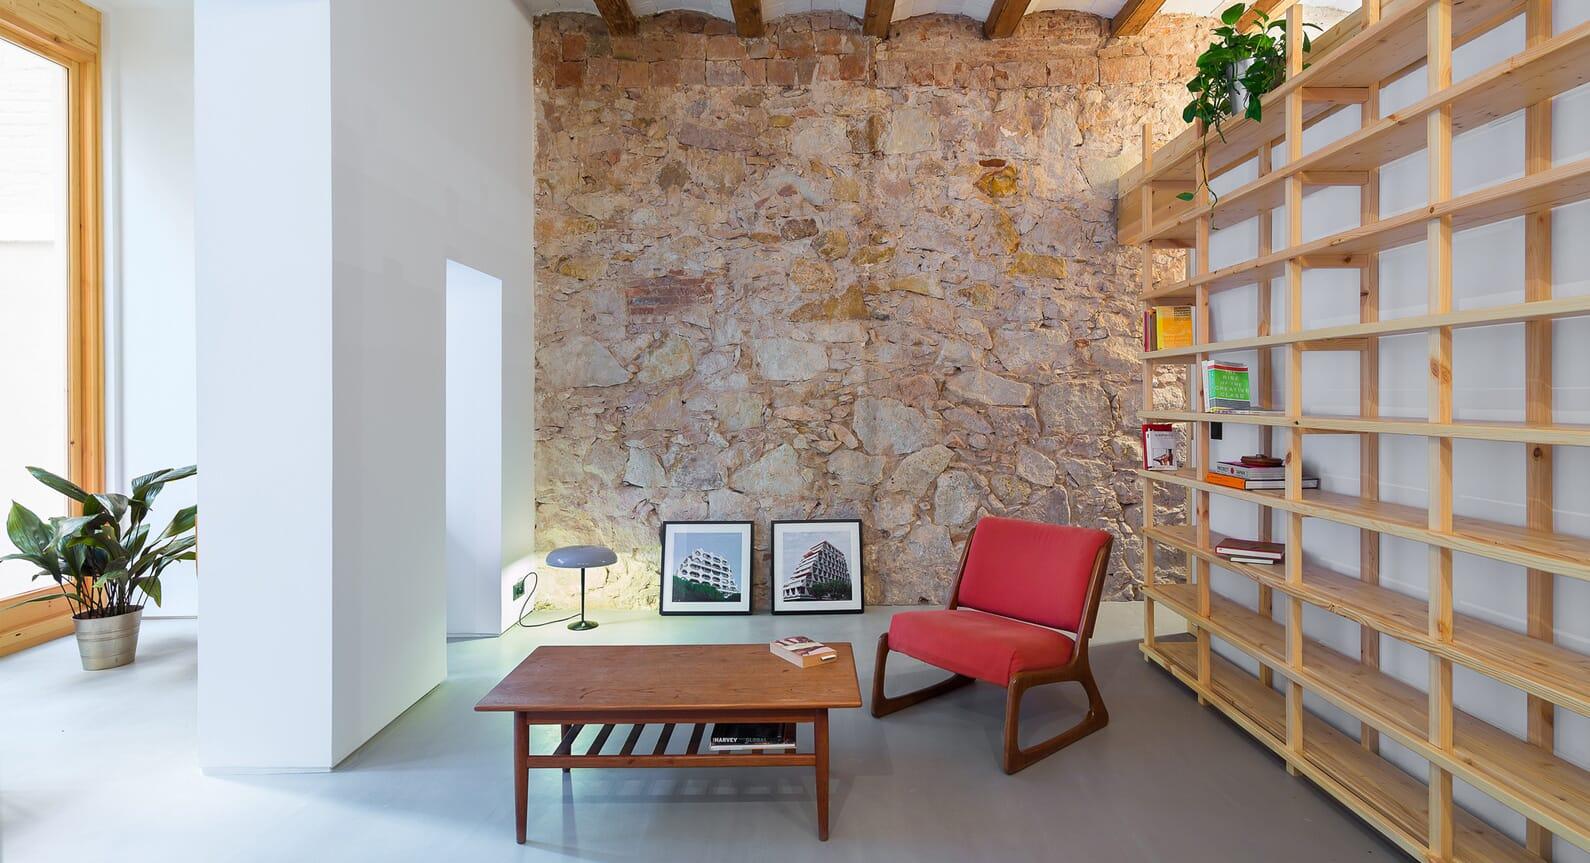 LoCa Studio Maximise Space and Comfort In This Family Home